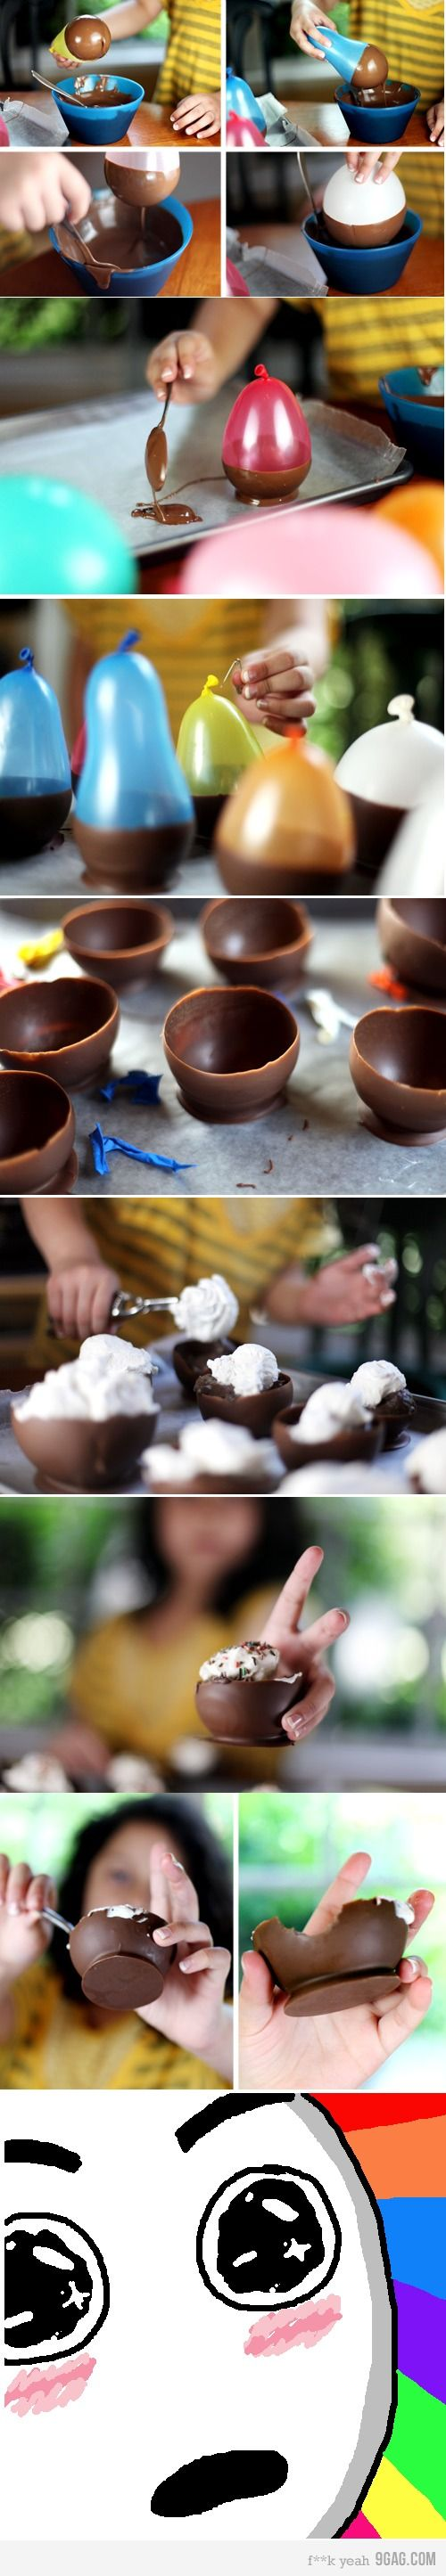 Edible Chocolate Bowls. Super cool.